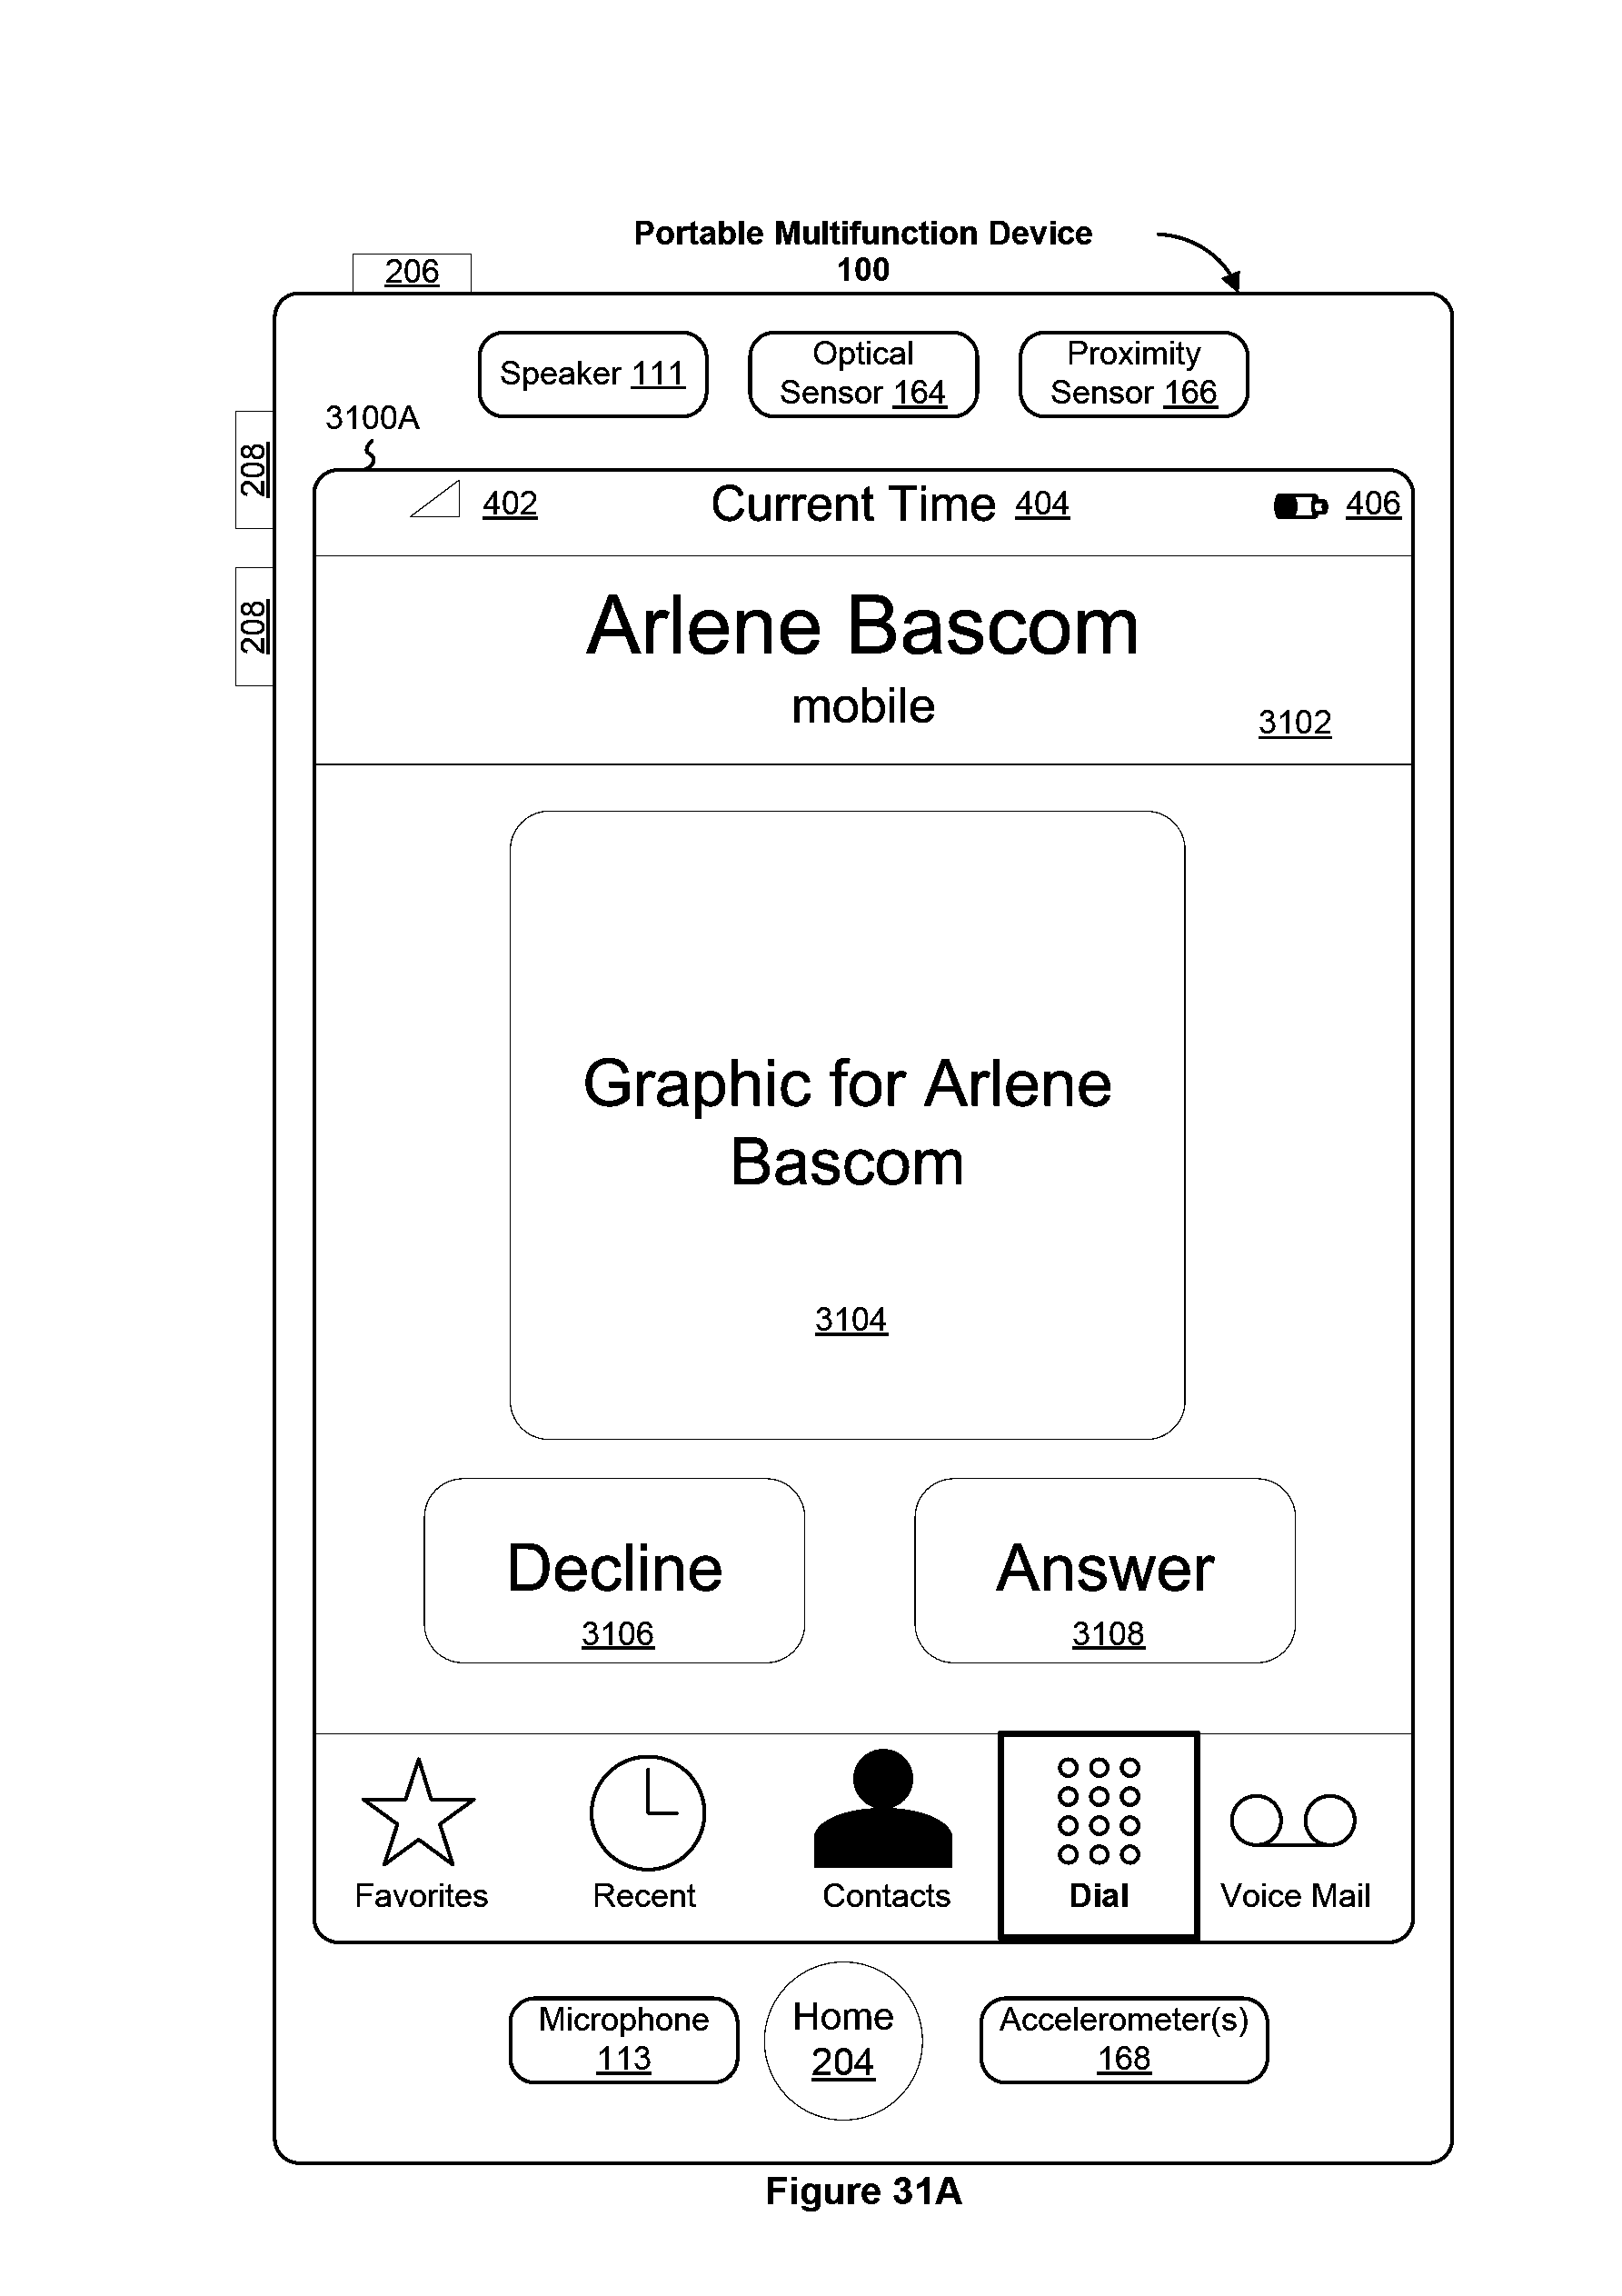 Patent US 7,479,949 B2